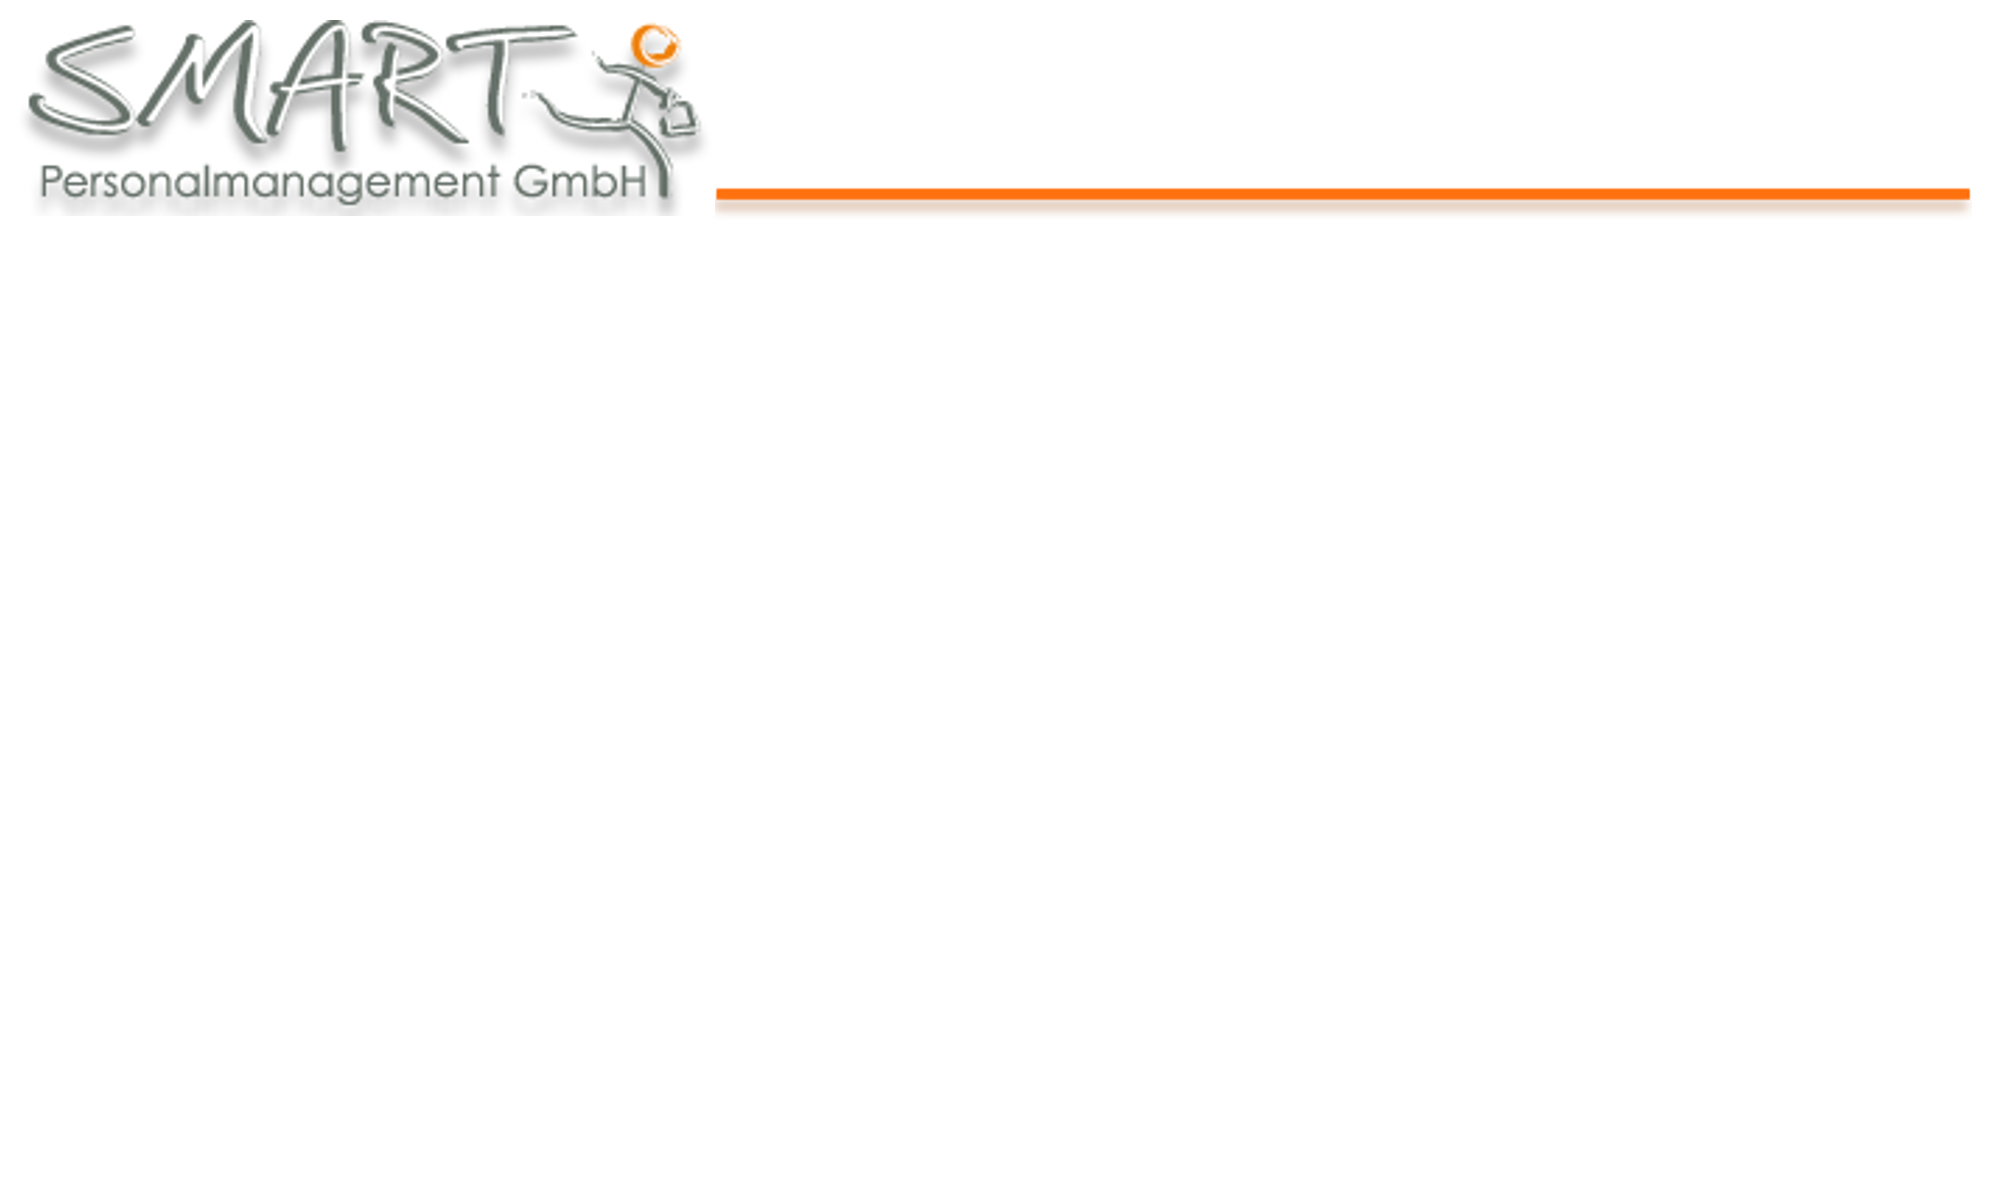 SMART Personalmanagement GmbH